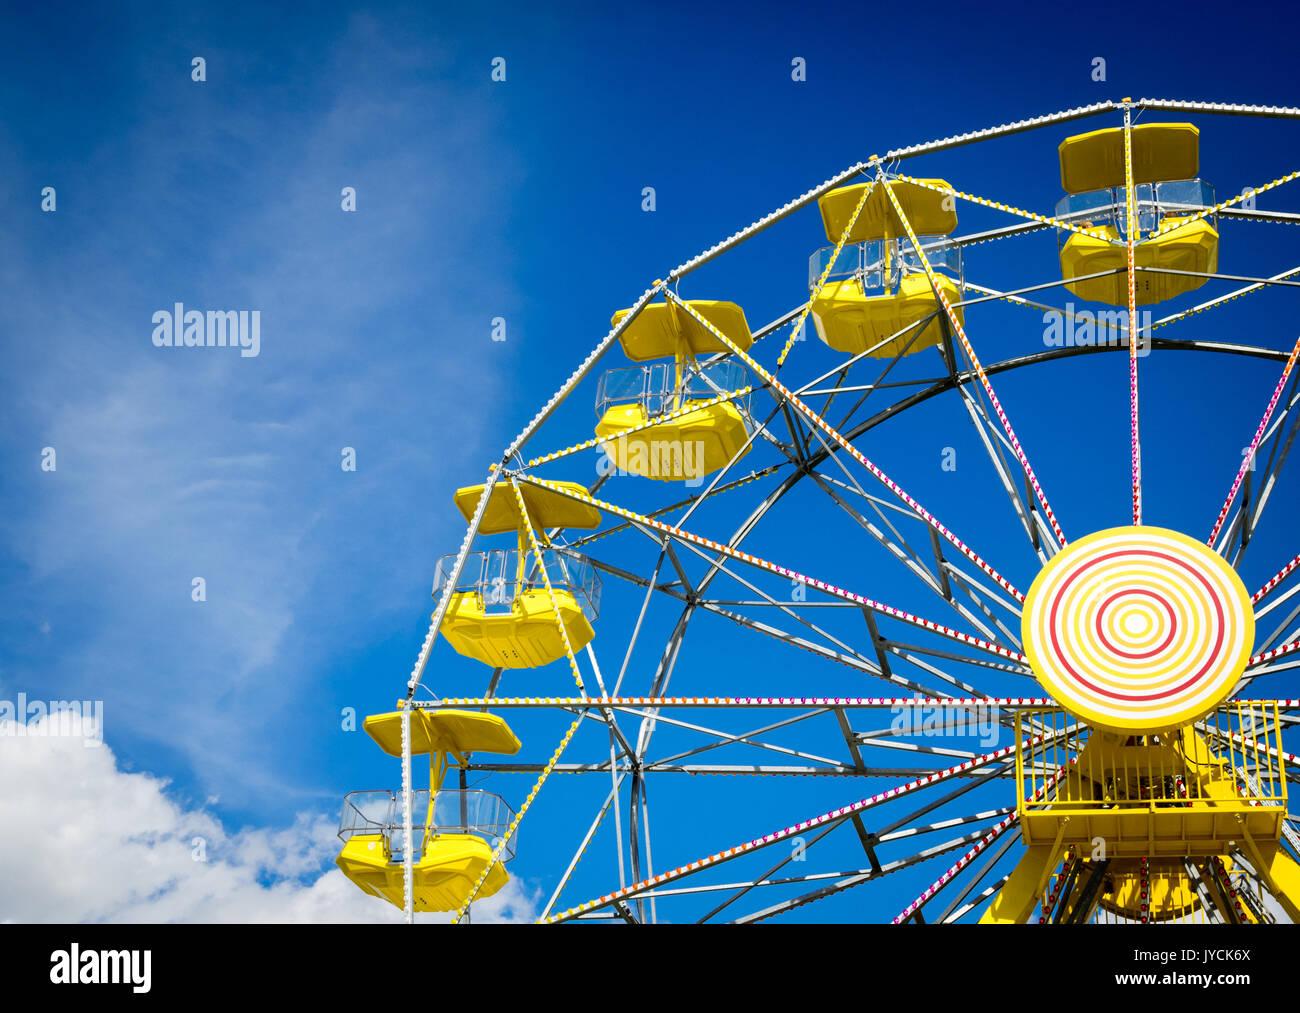 The yellow ferris wheel at the PotashCorp Playland at Kinsmen Park in Saskatoon, Saskatchewan, Canada. - Stock Image